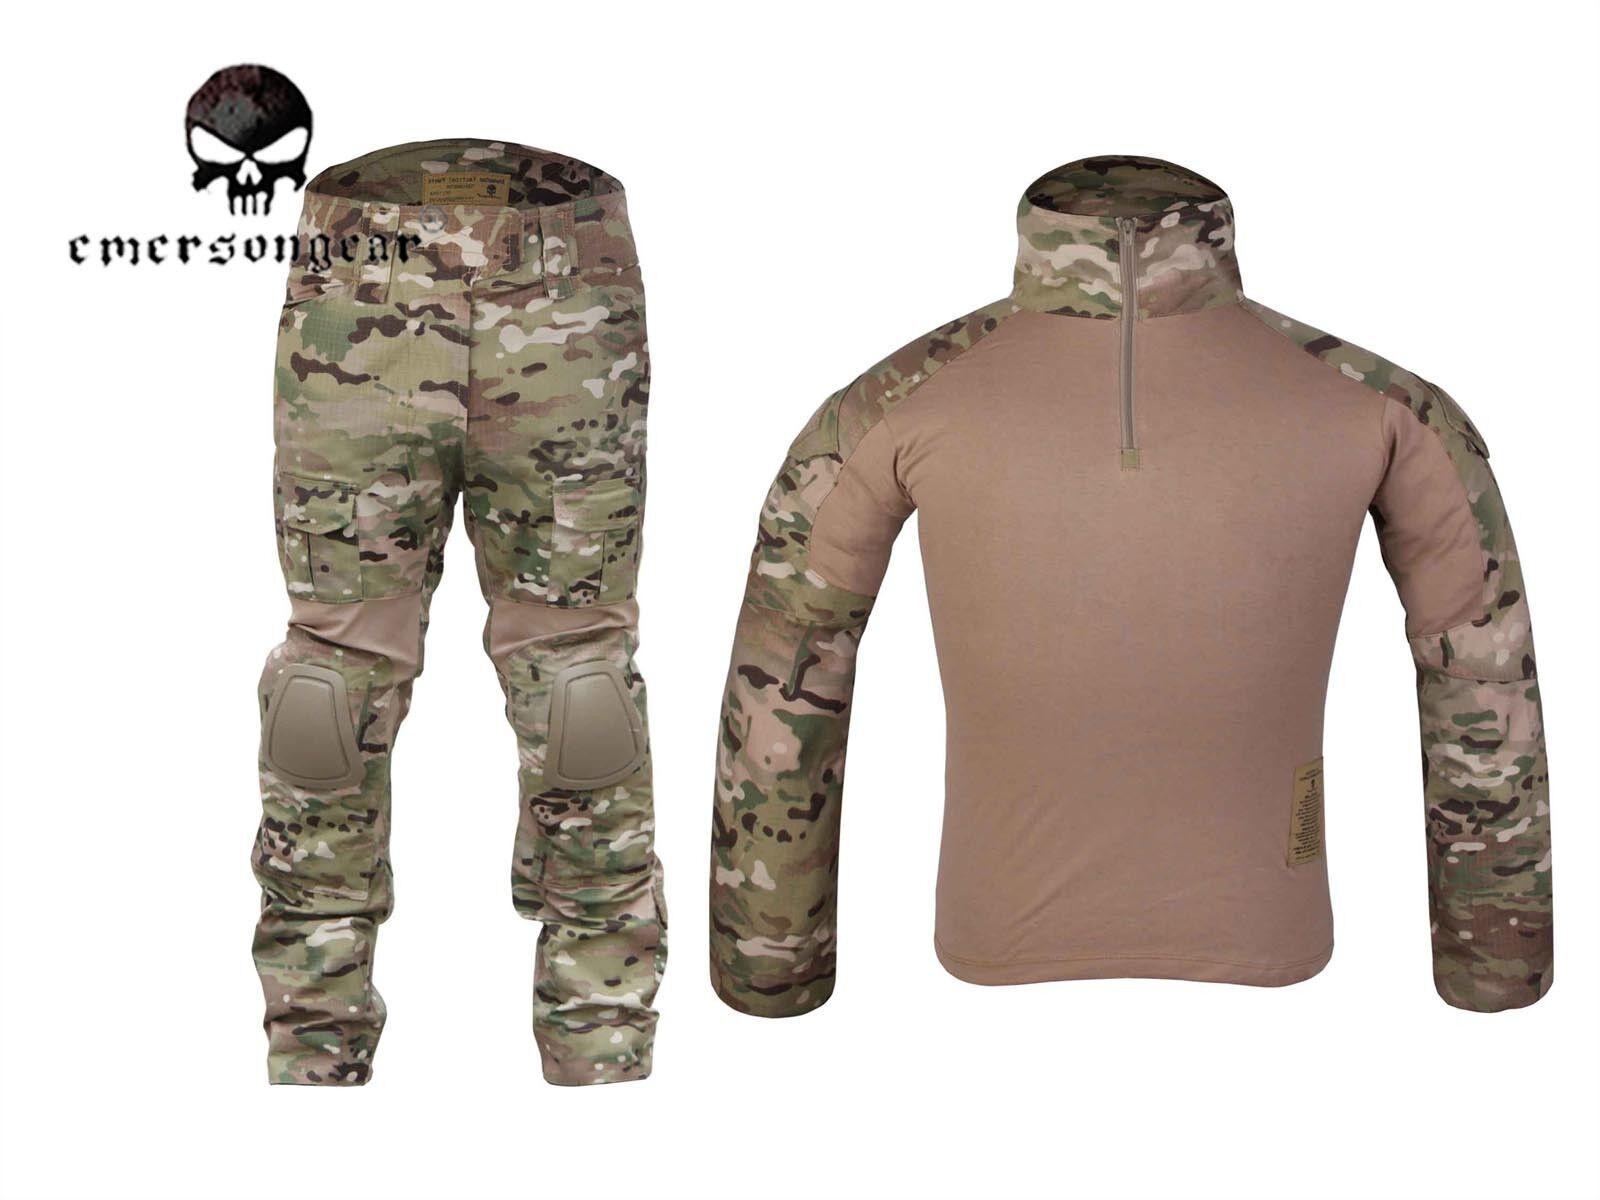 EMERSON Gen2 Cype Style Combat Uniform Tactical Hunting BDU MultiCam